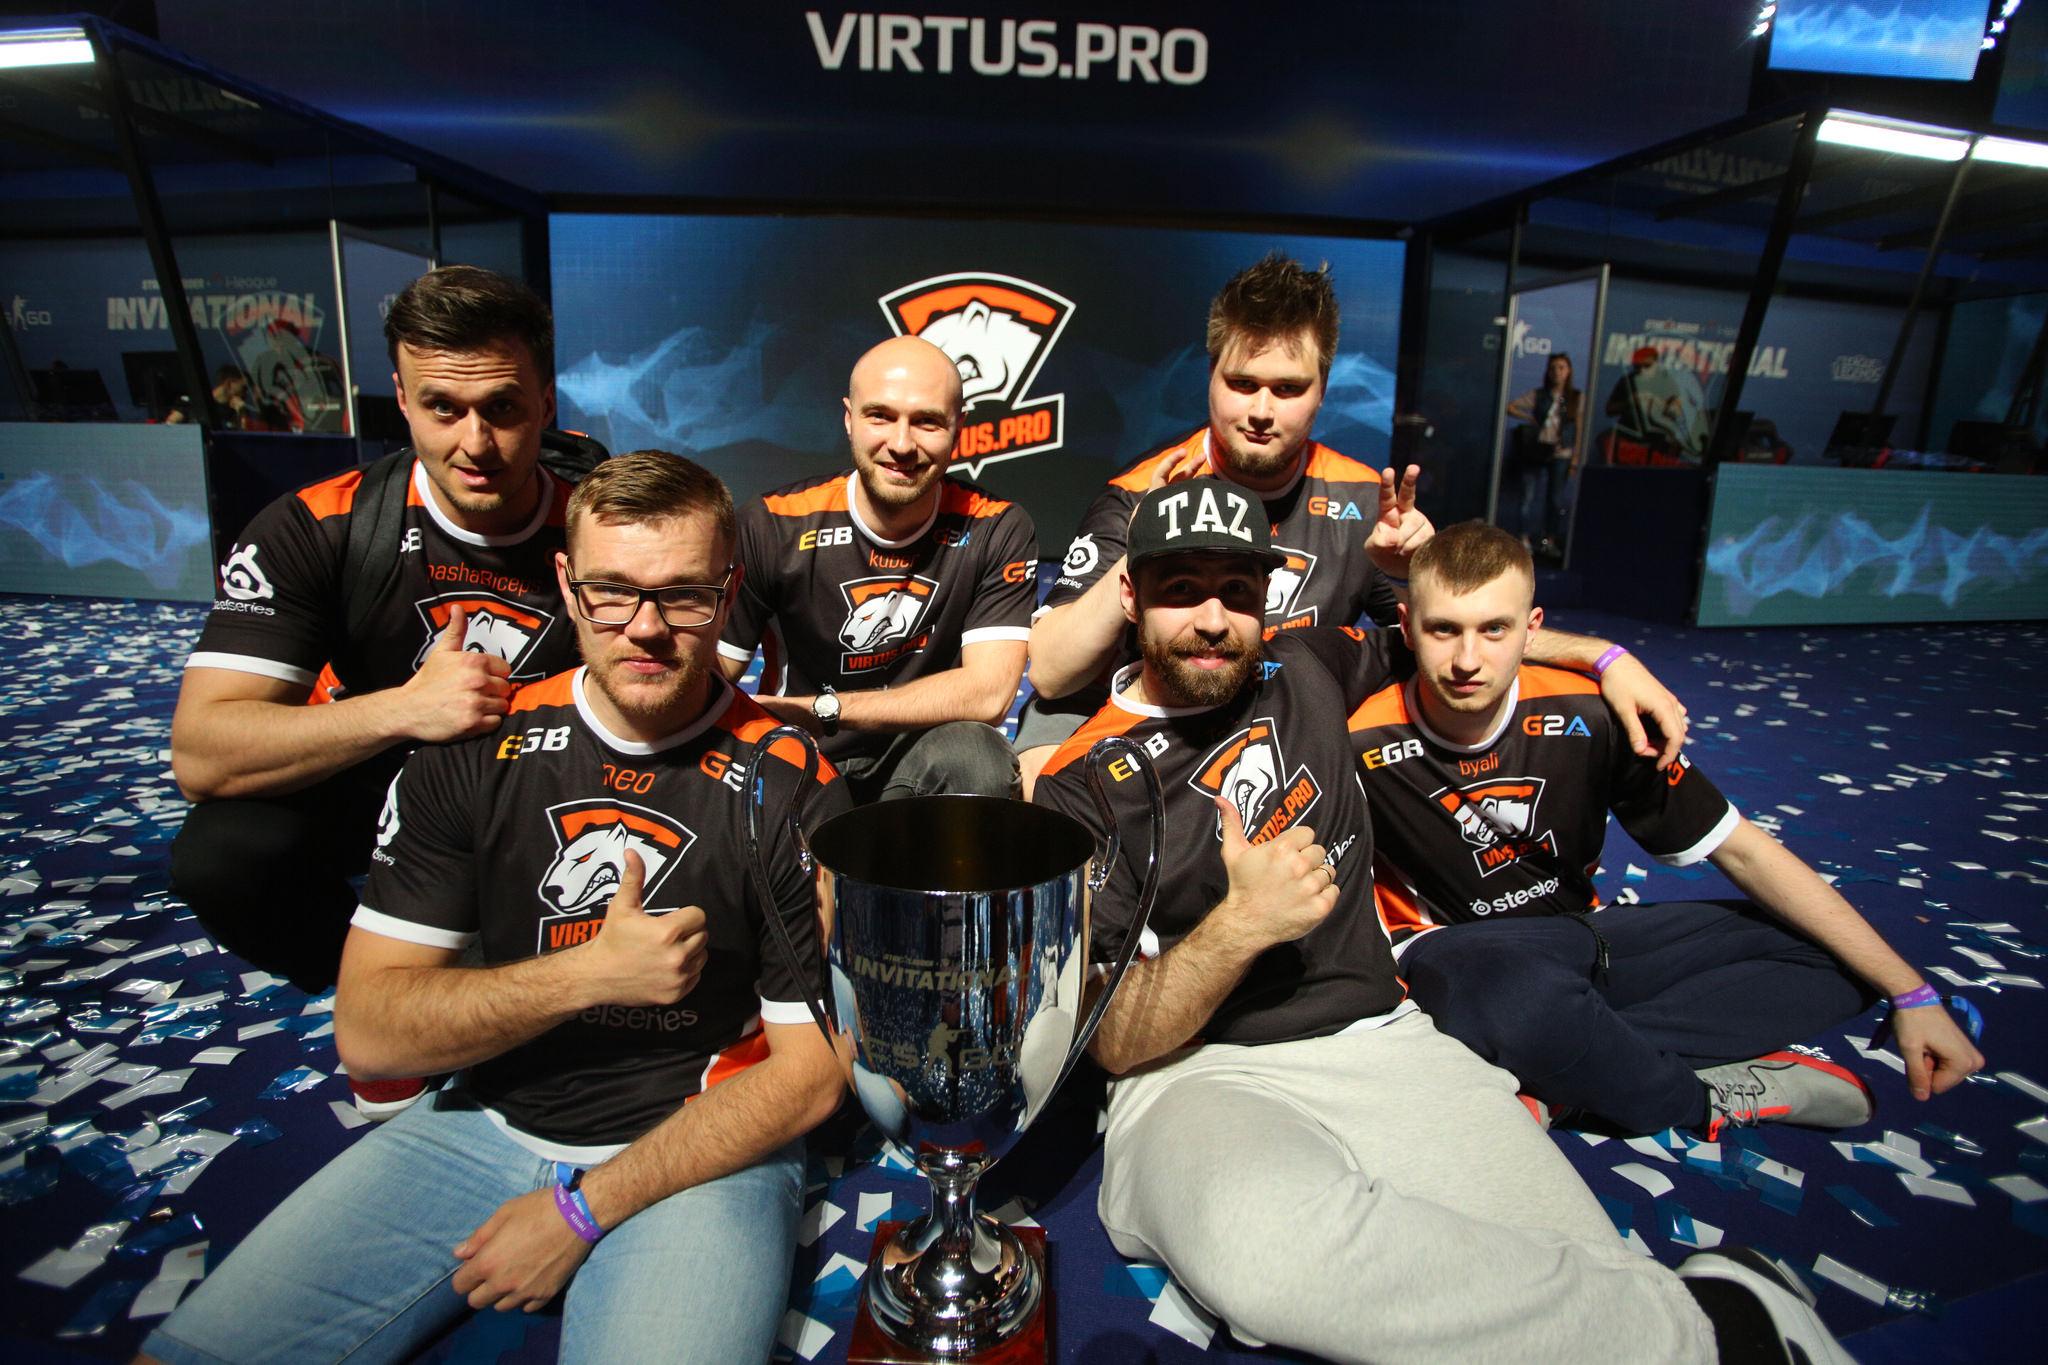 Virtus.pro CS:GO